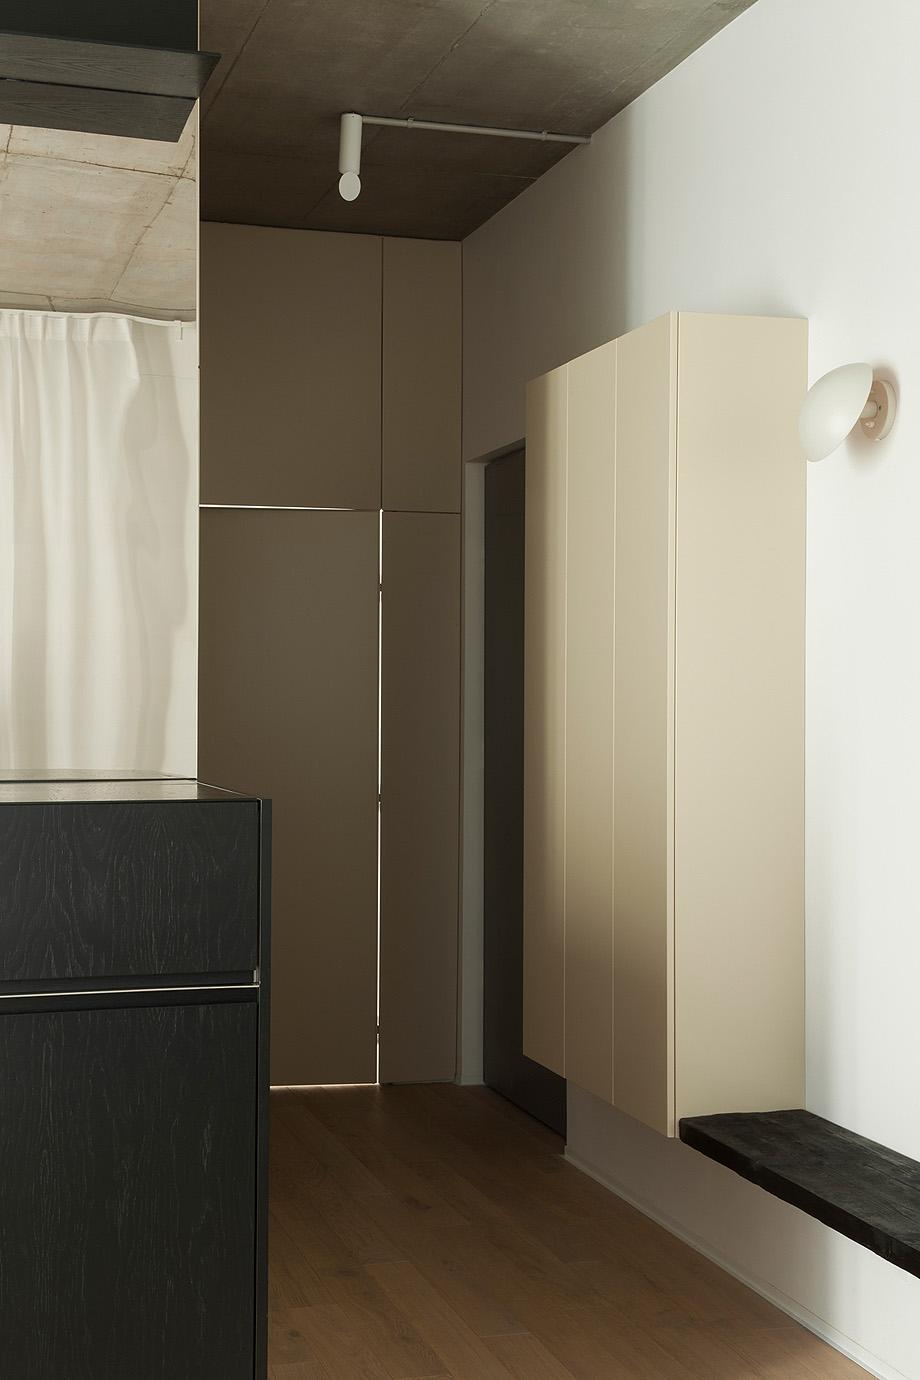 apartamento de alquiler en varsovia por thisispaper studio (6)